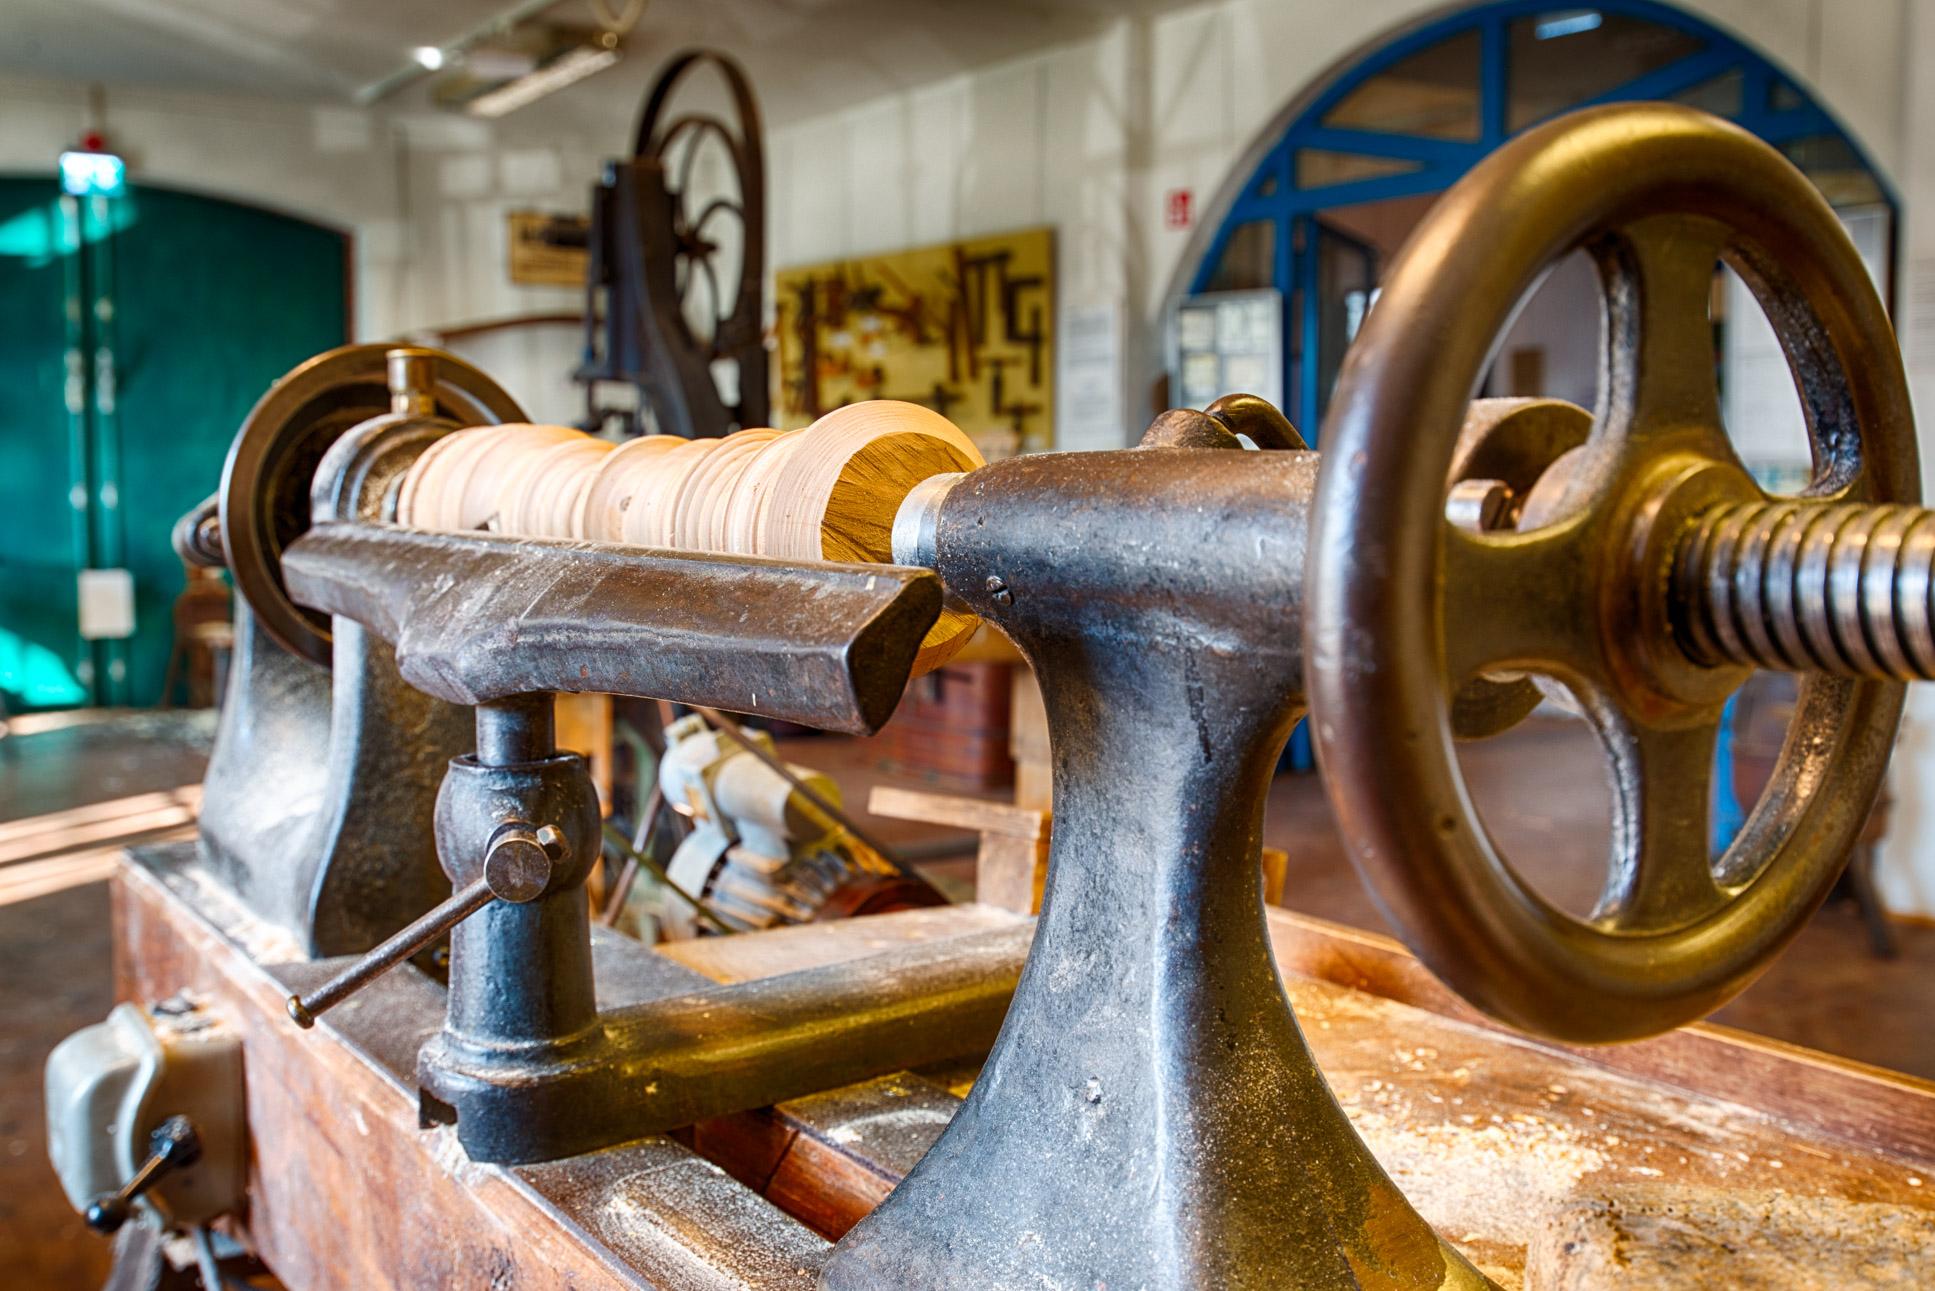 Handwerksmuseum-Horneburg-Rundgang2018-2853_HDR-19